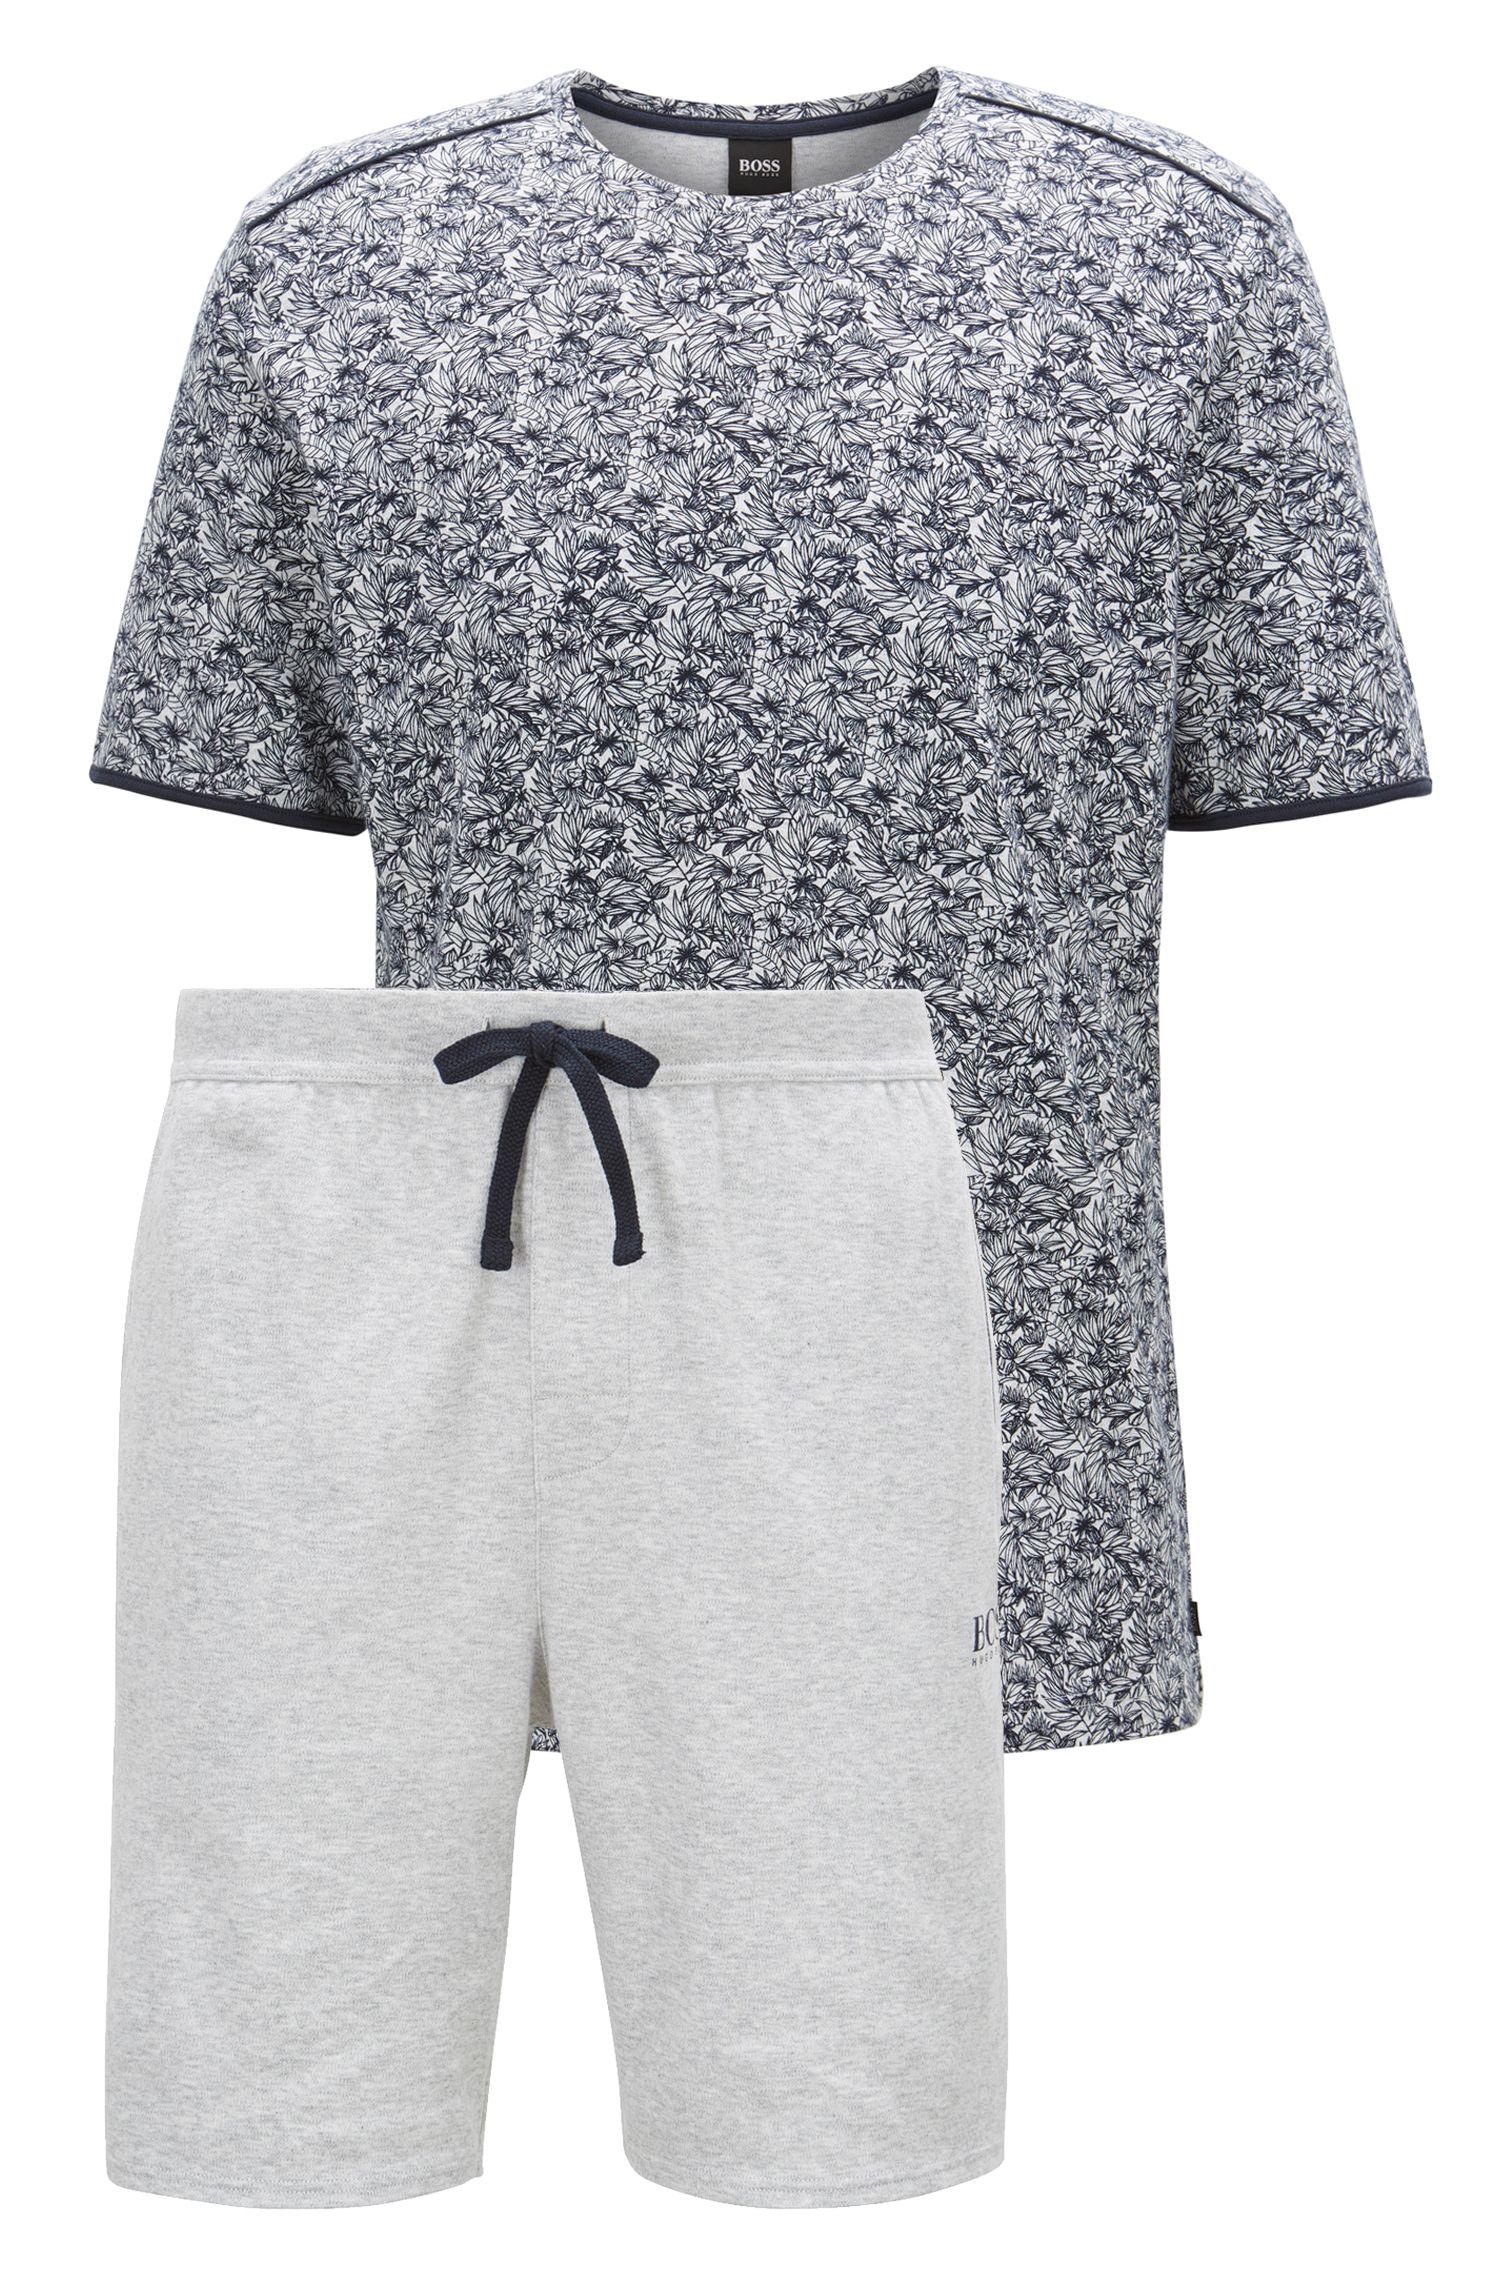 Pyjama en coton interlock à imprimé floral